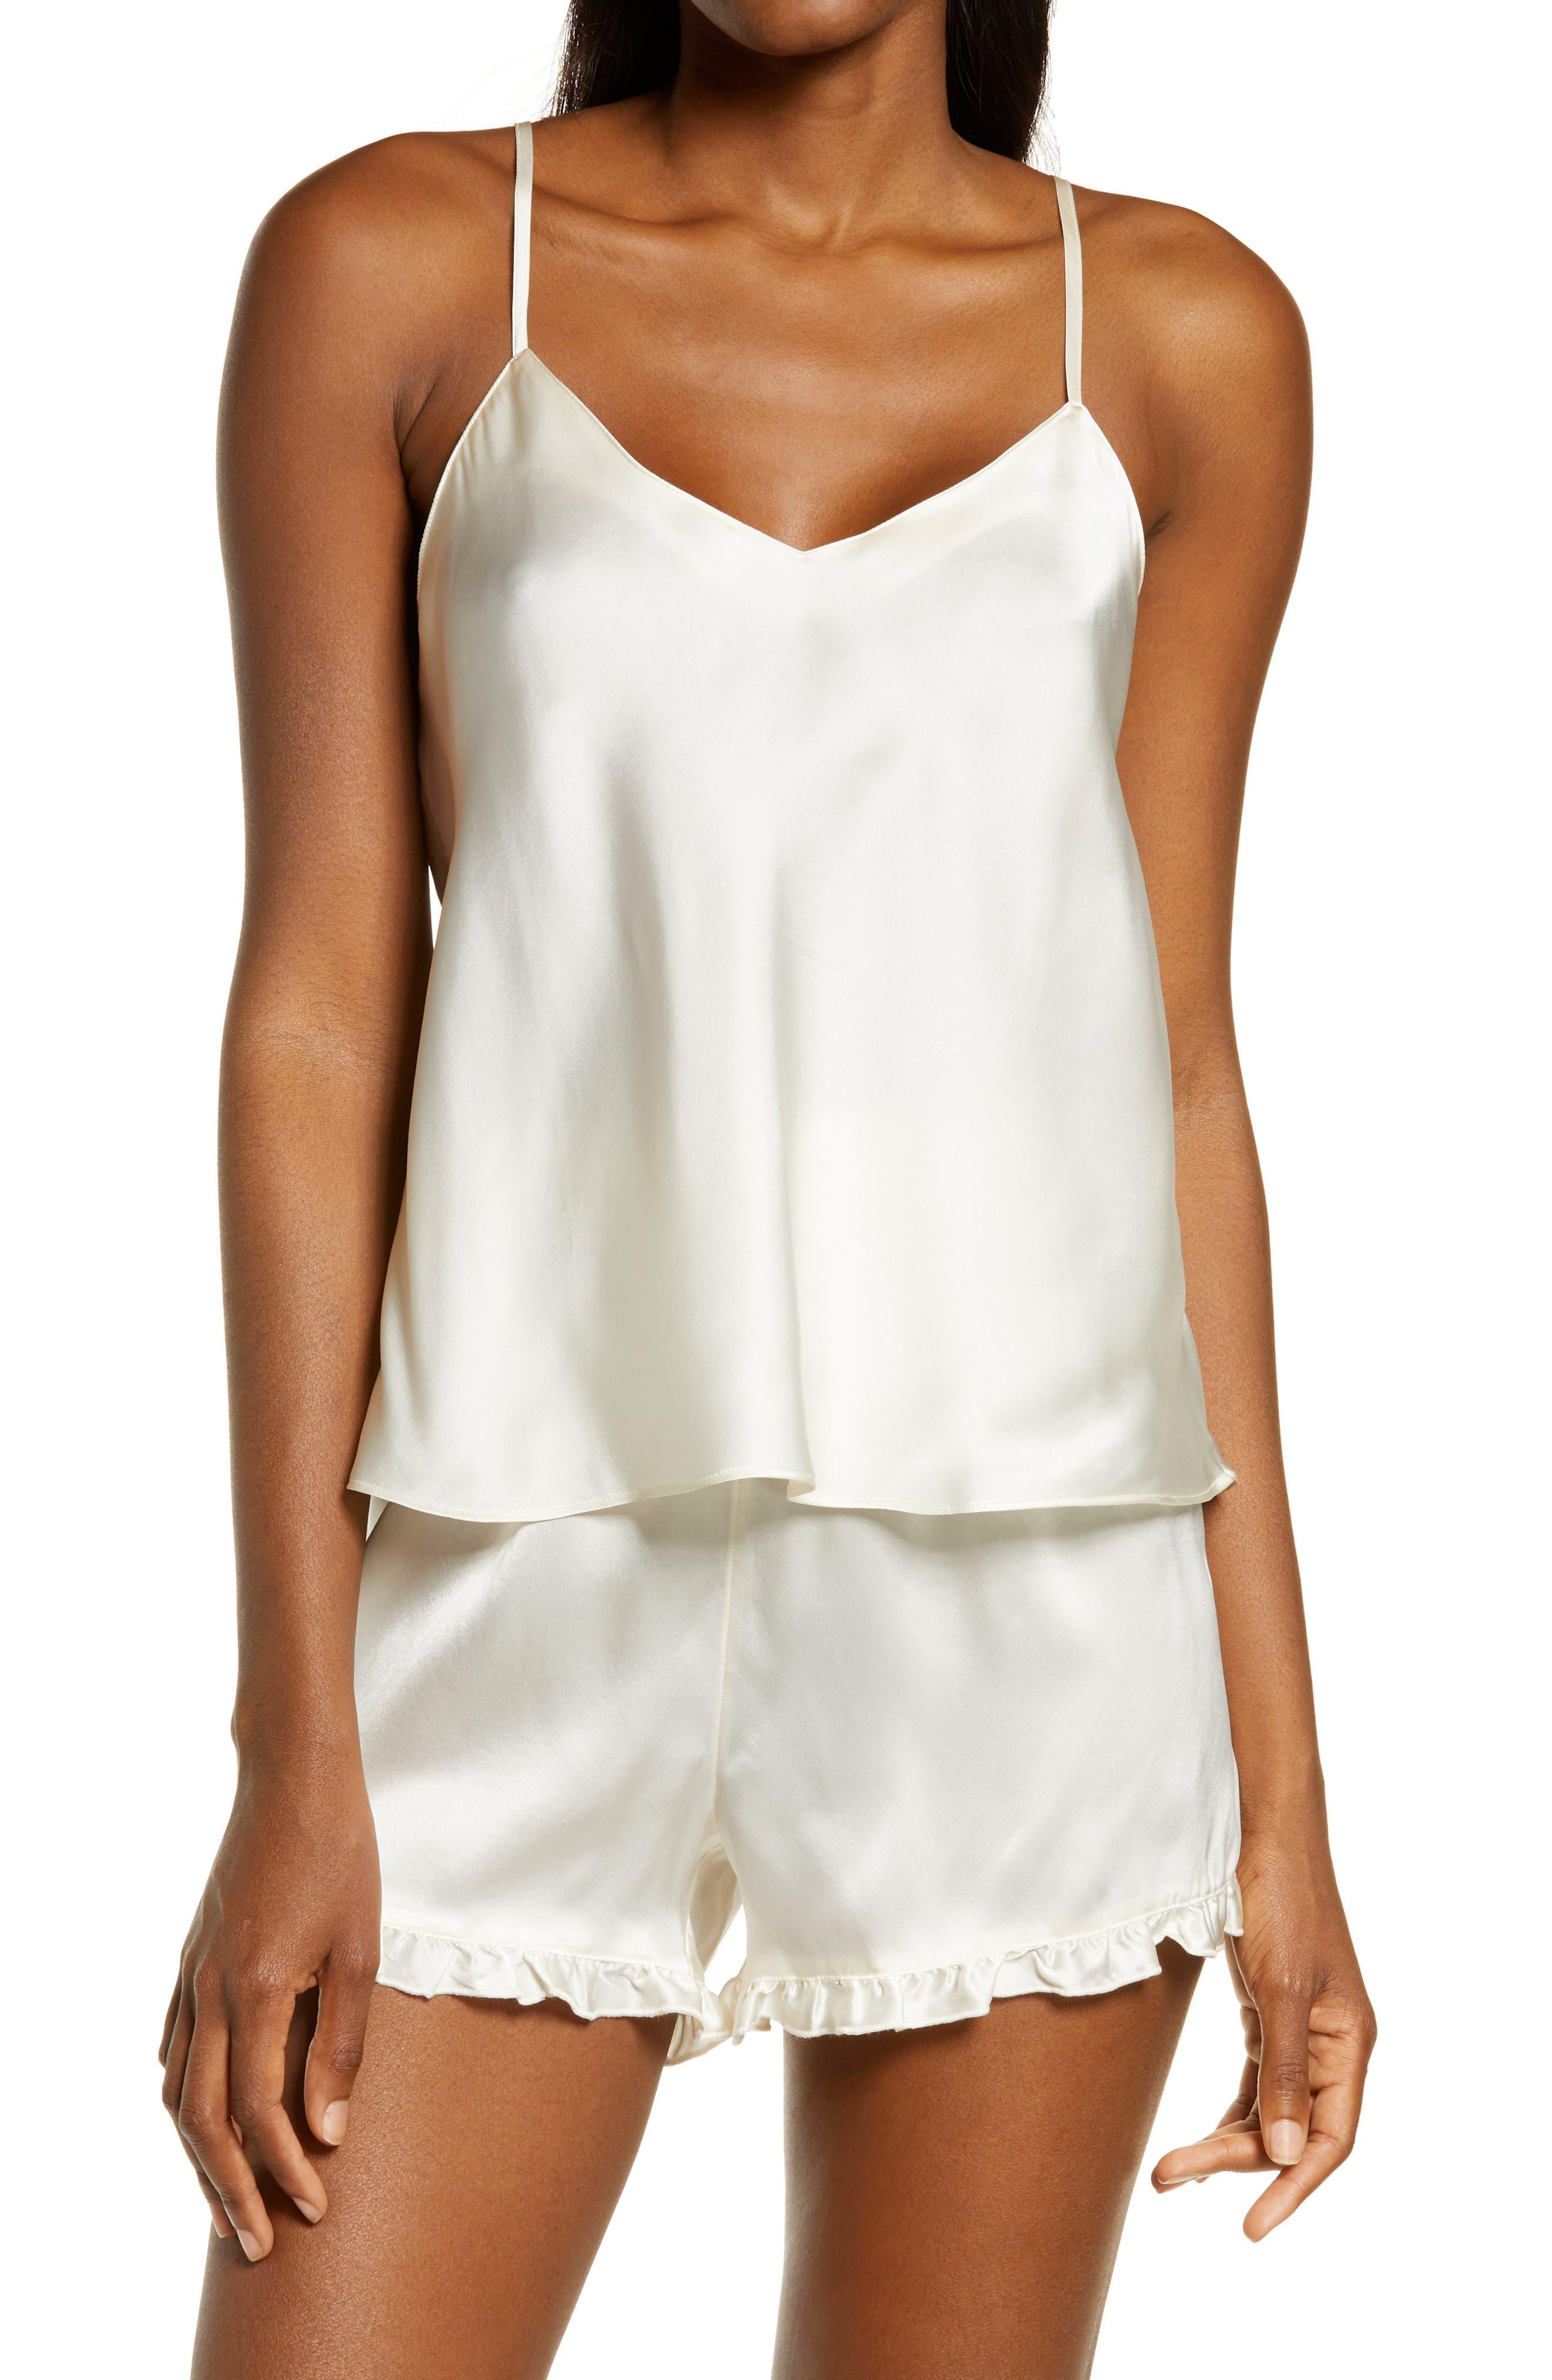 Pajamas Set Bridal Pajama Set Womens Silk Pajama Set Satin Short and Shirt FREE DELIVERY Gift for Her Silk sleepwear